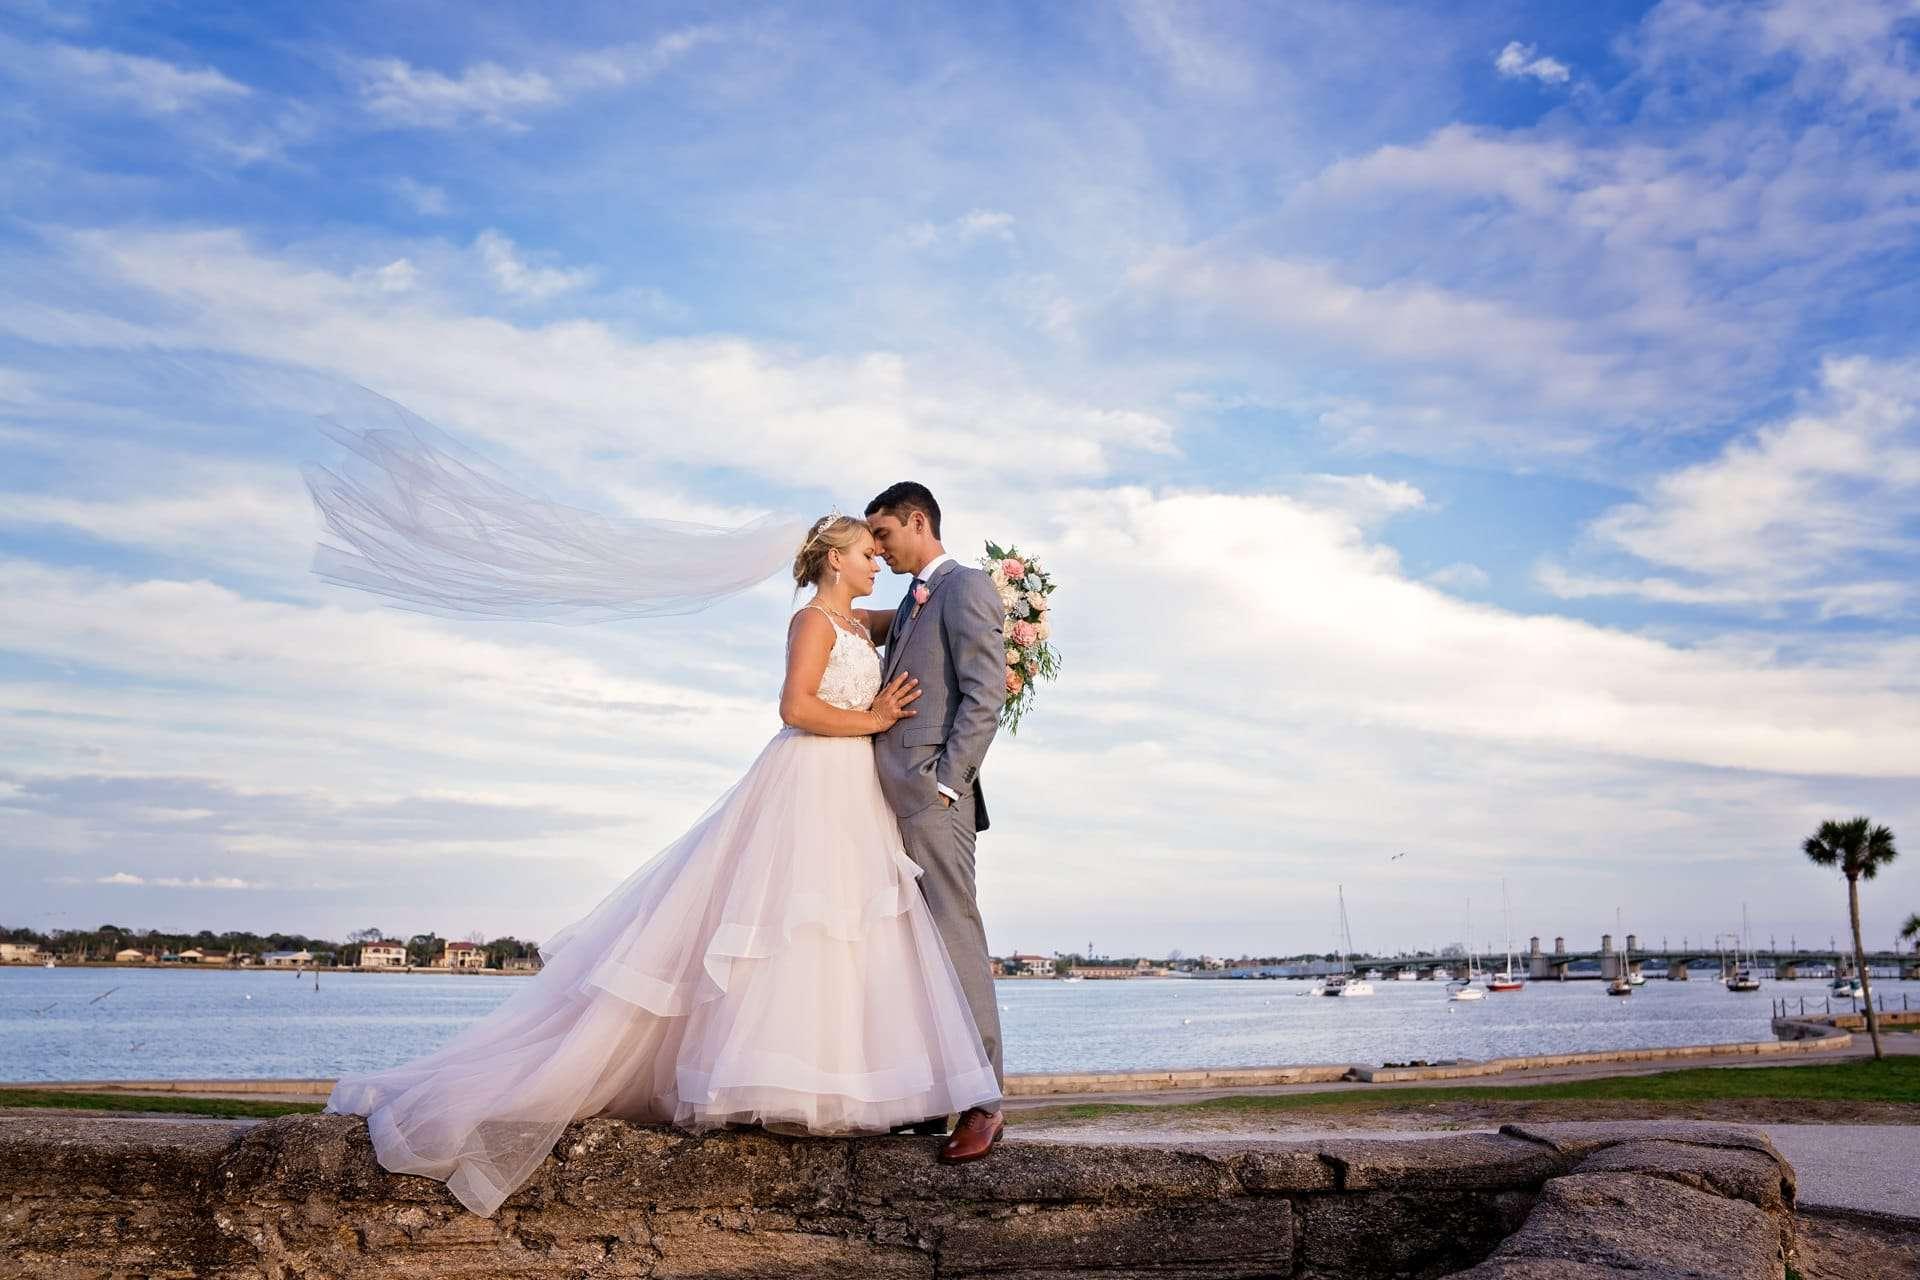 Alexis and Evan's White Room Wedding